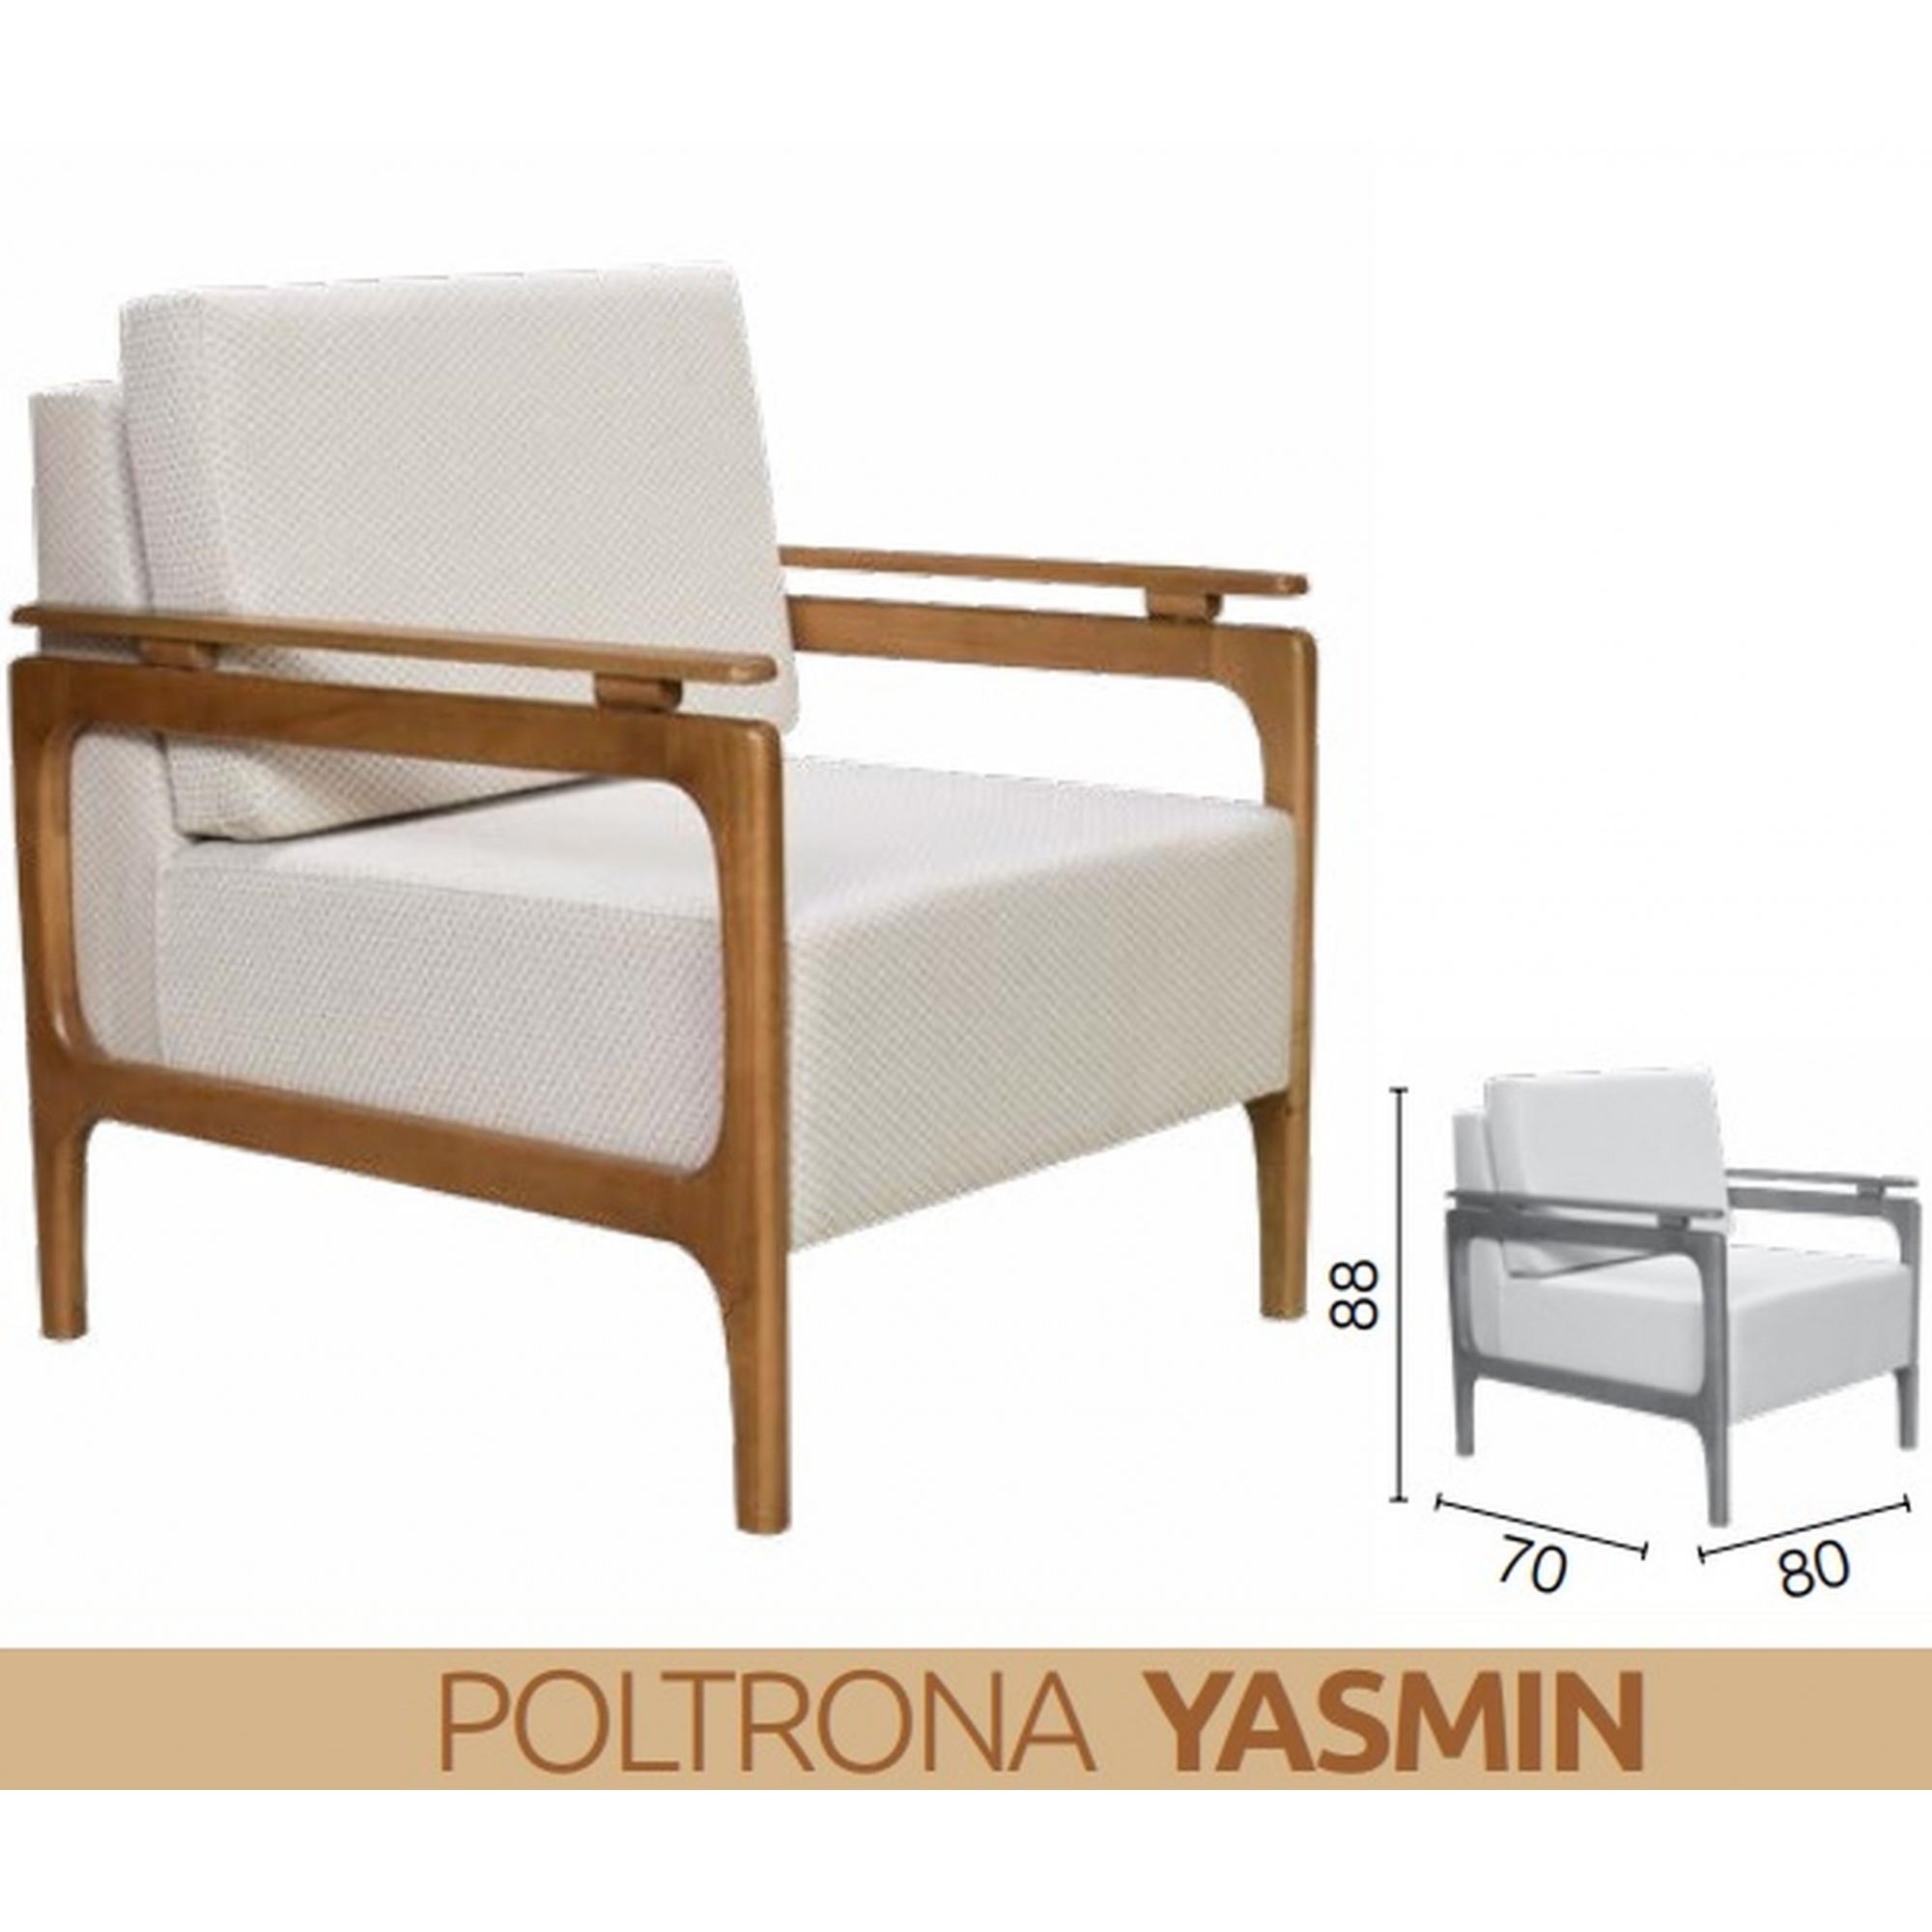 Poltrona Decorativa Yasmin pra Sala Casa Pé Madeira Mobília